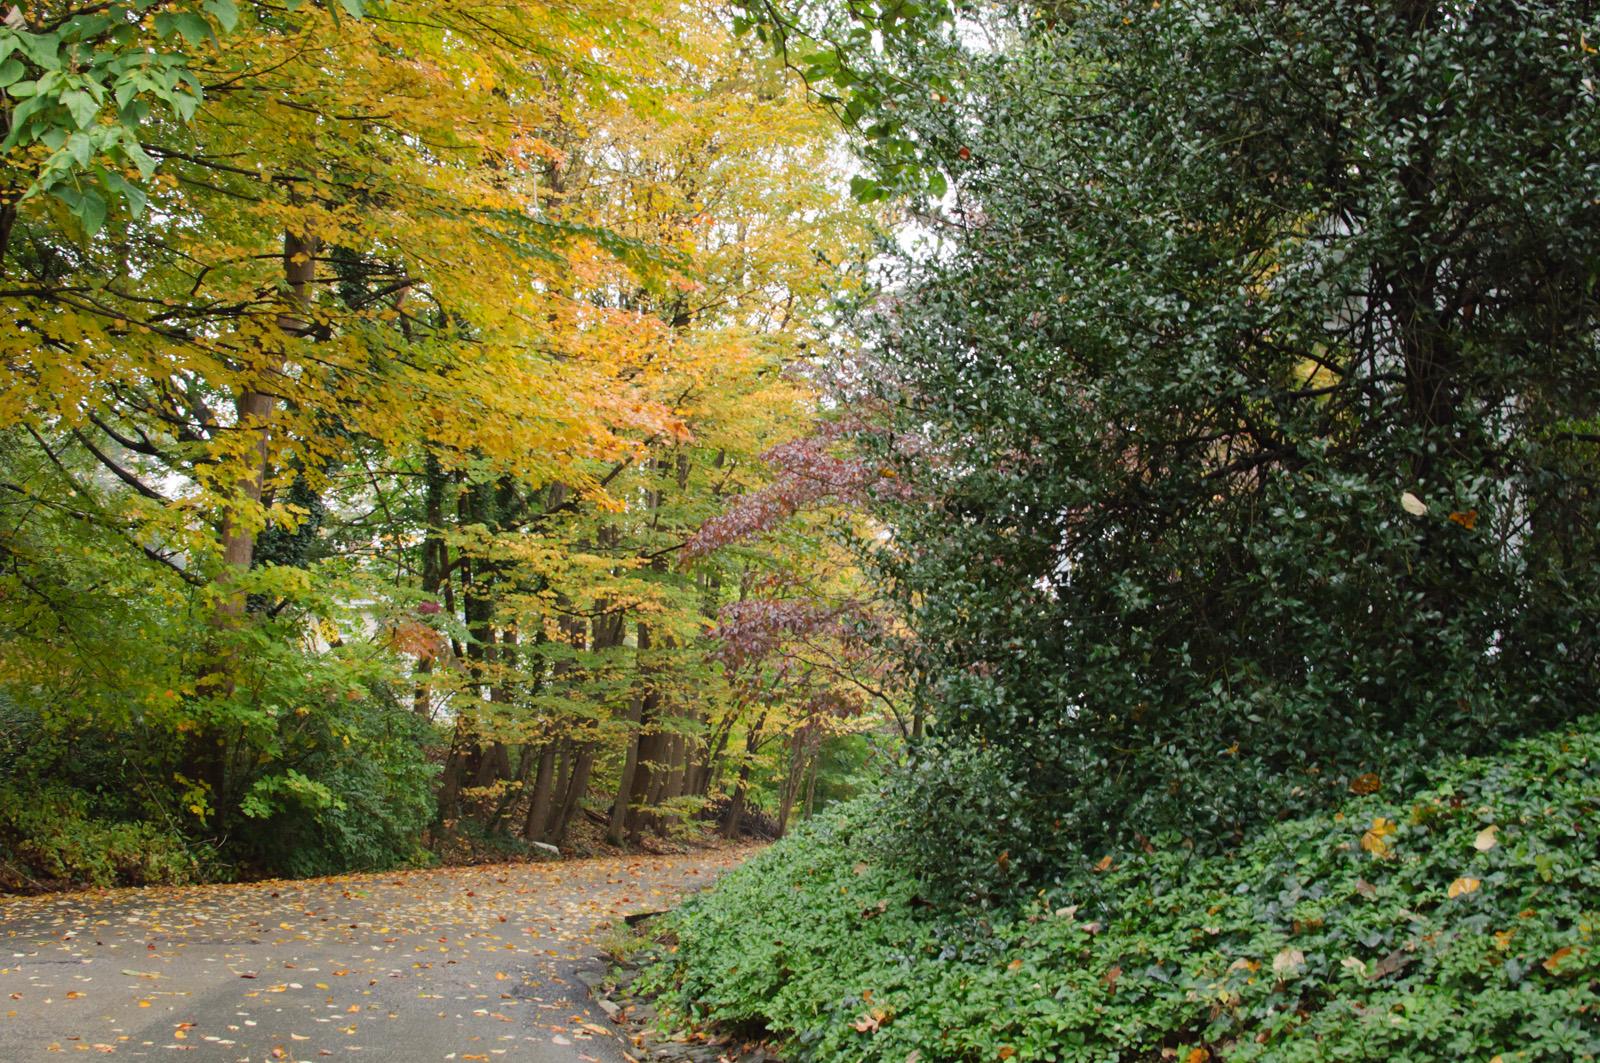 Wissahickon Valley, Chestnut Hill